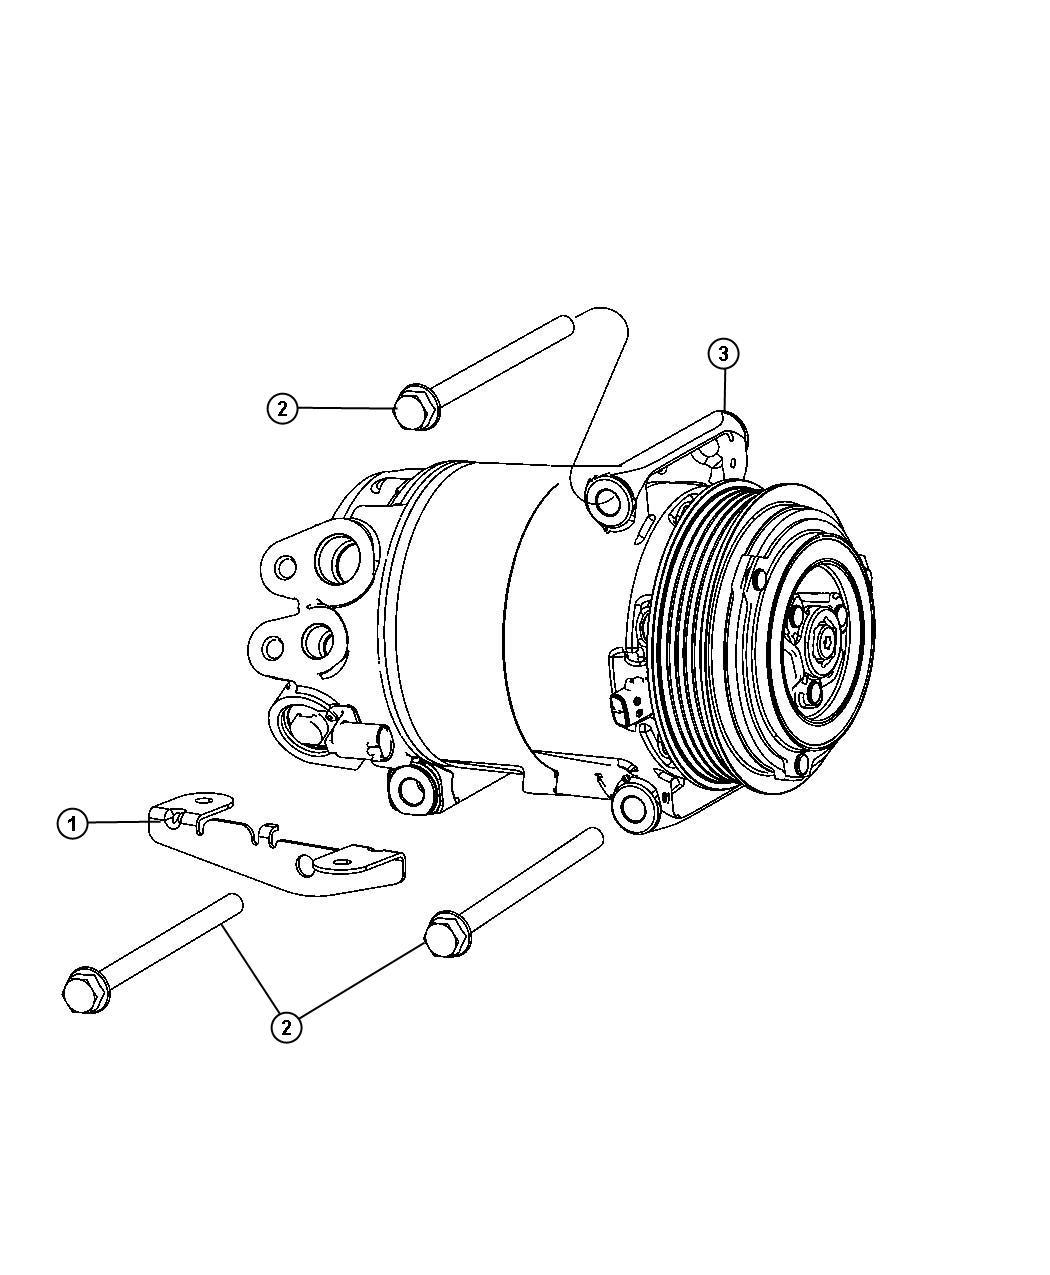 Ram Screw Hex Head M8x1 25x110 Alternator